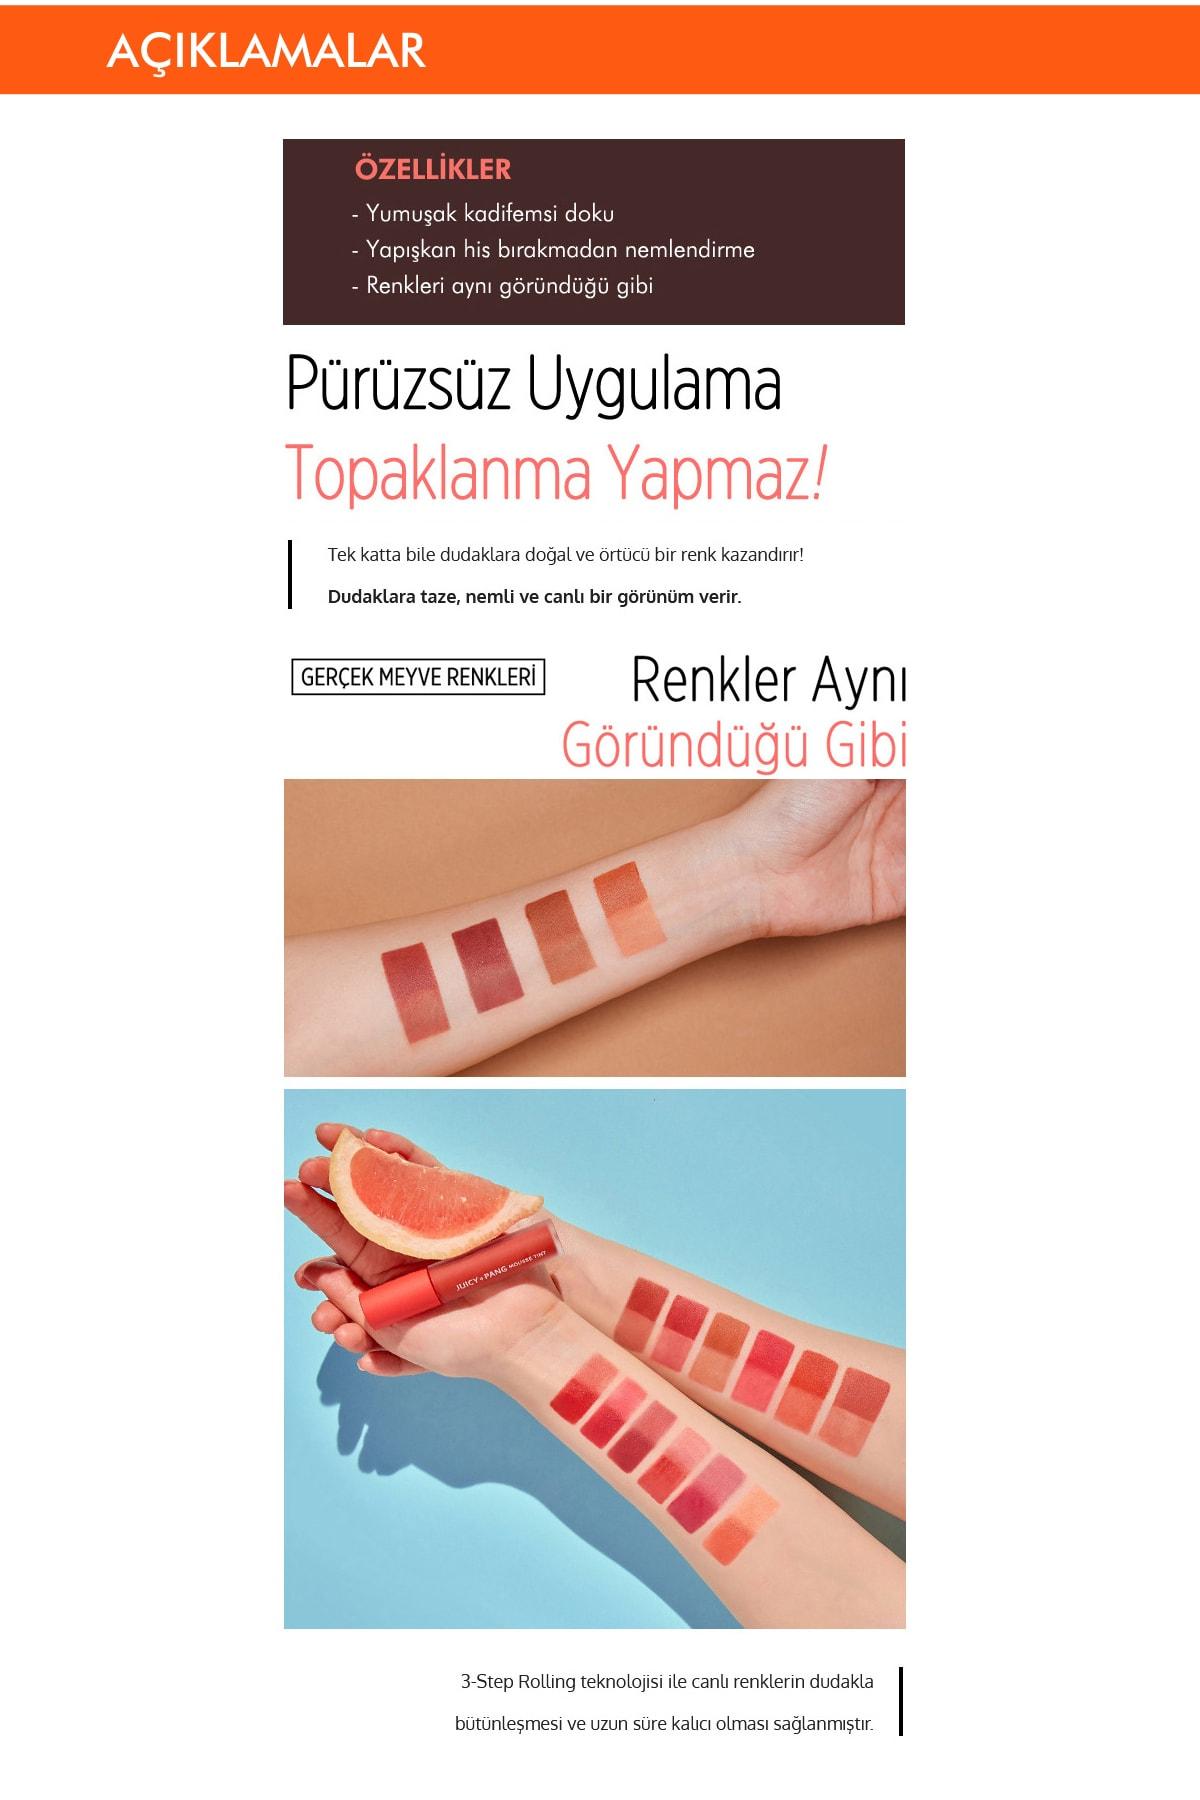 Missha Pürüzsüz Görünüm Sunan Kalıcı Köpük Tint Ruj APIEU Juicy Pang Mousse Tint (CR07) 3